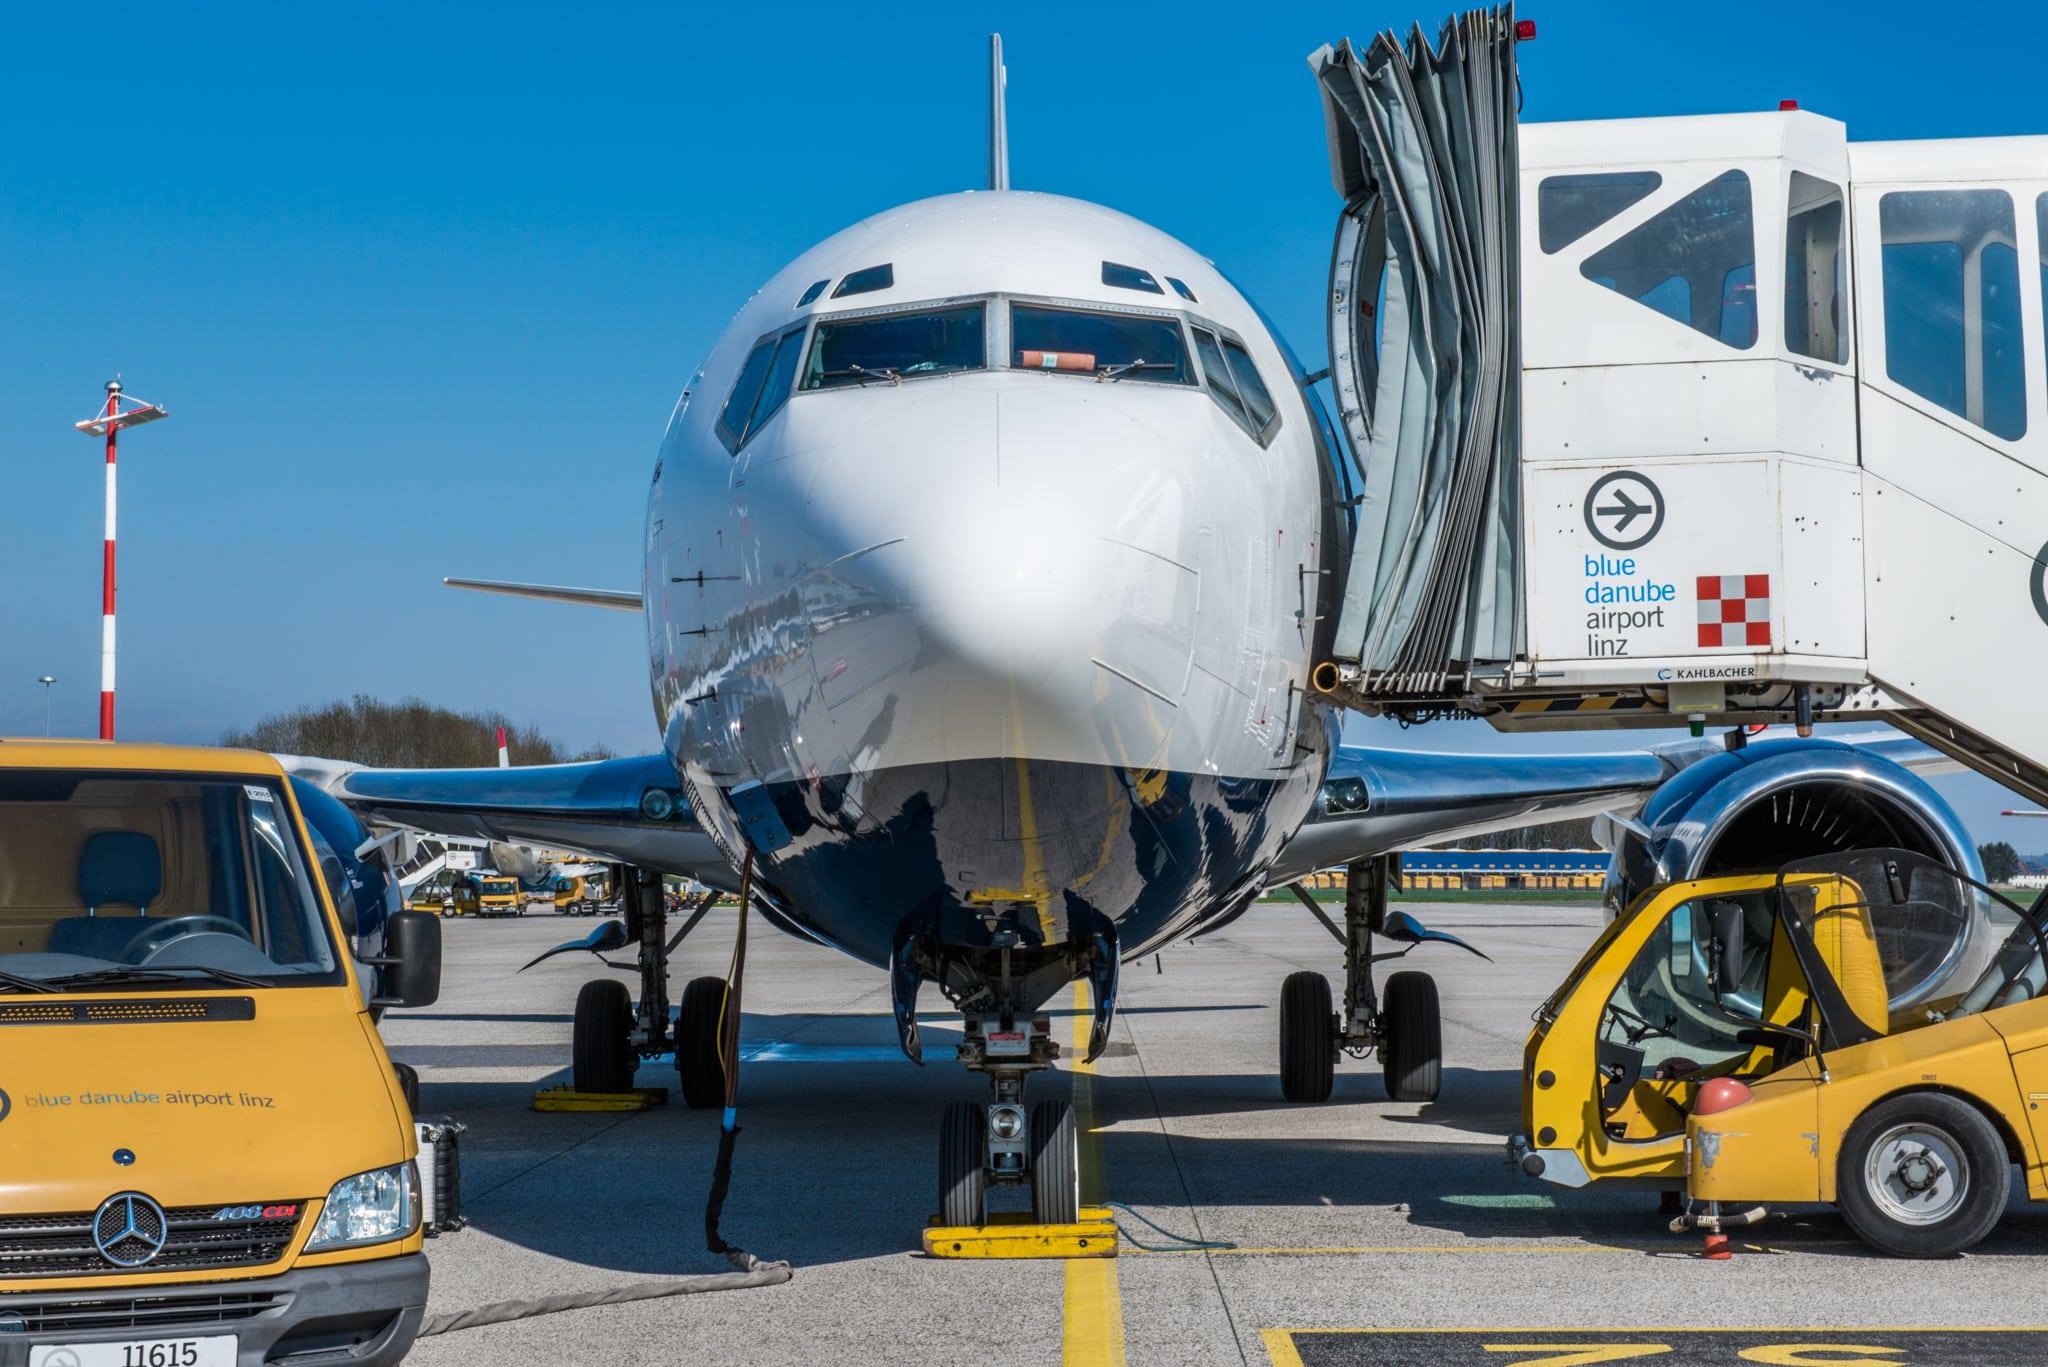 Boeing 737-500 VIP